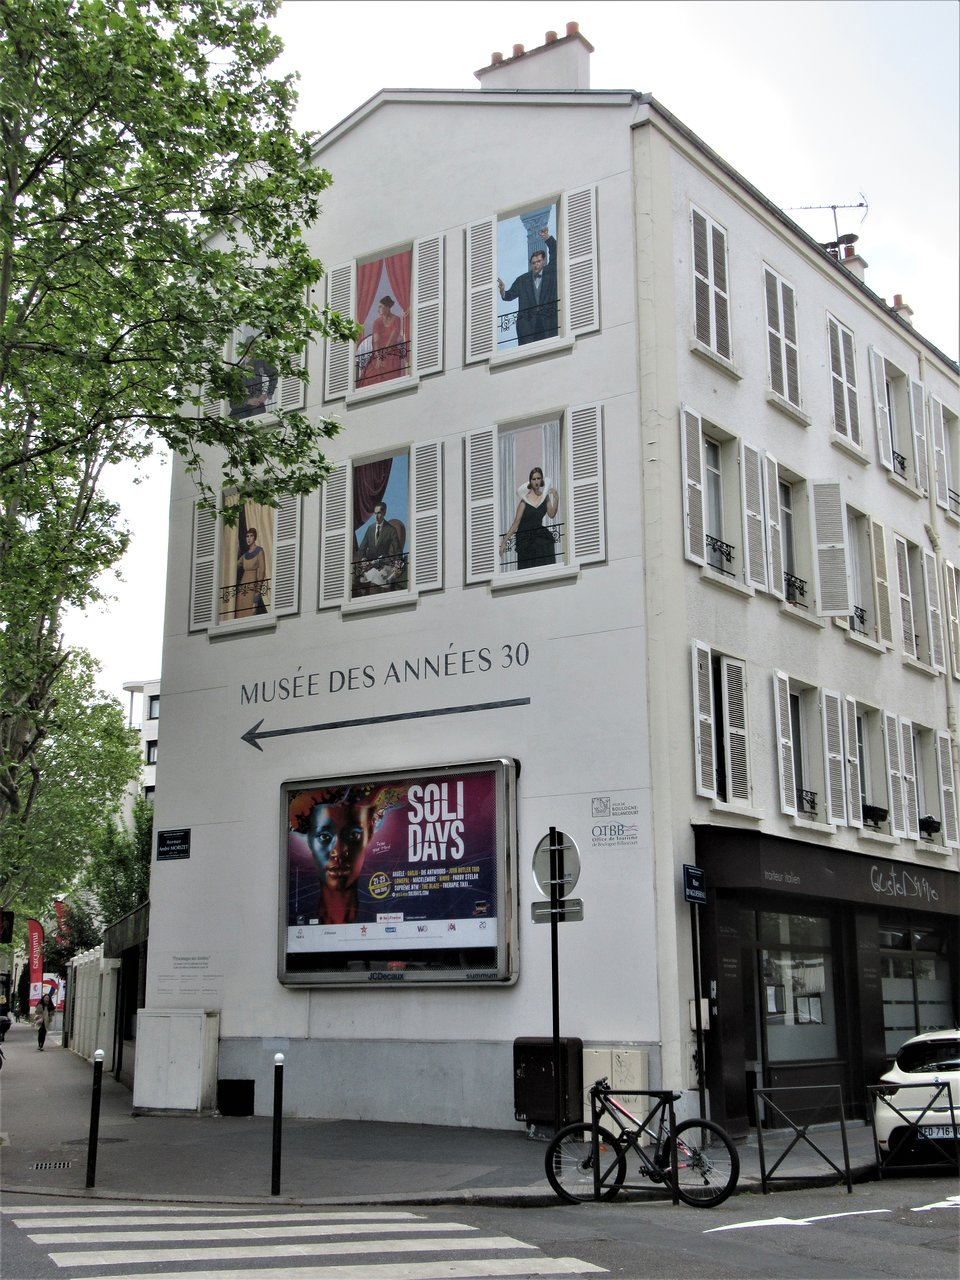 Boulogne-Billancourt, Frankreich: Tourismus in Boulogne-Billancourt